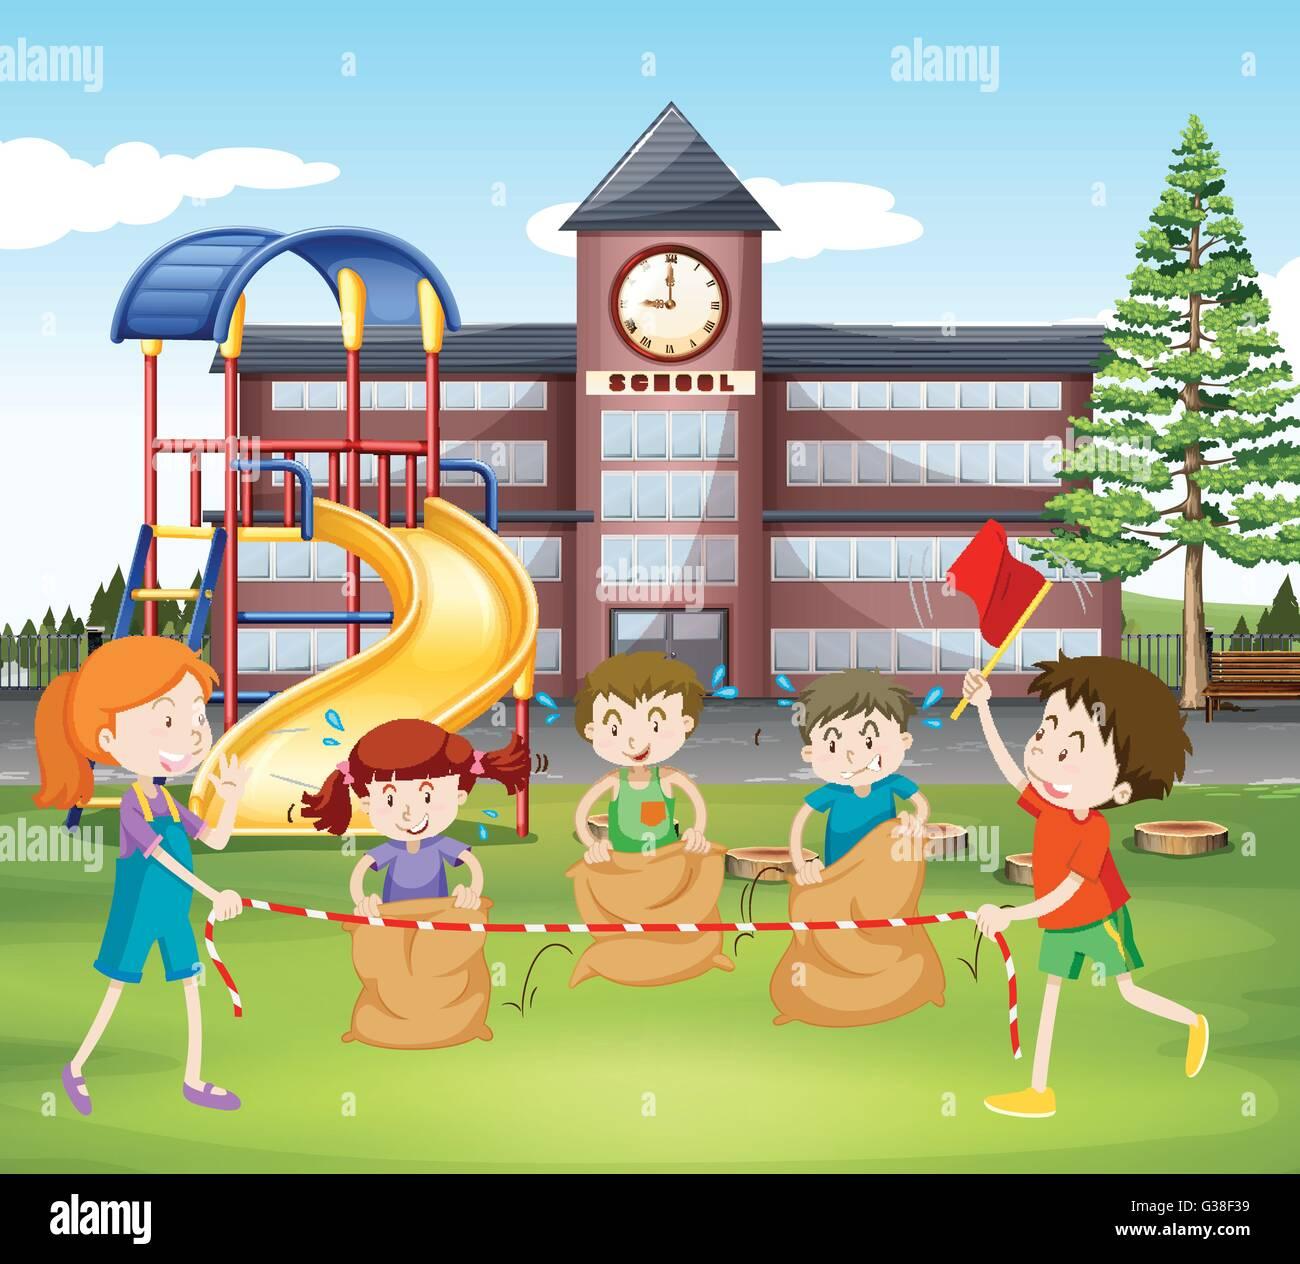 Children jumping sacks at school illustration - Stock Vector